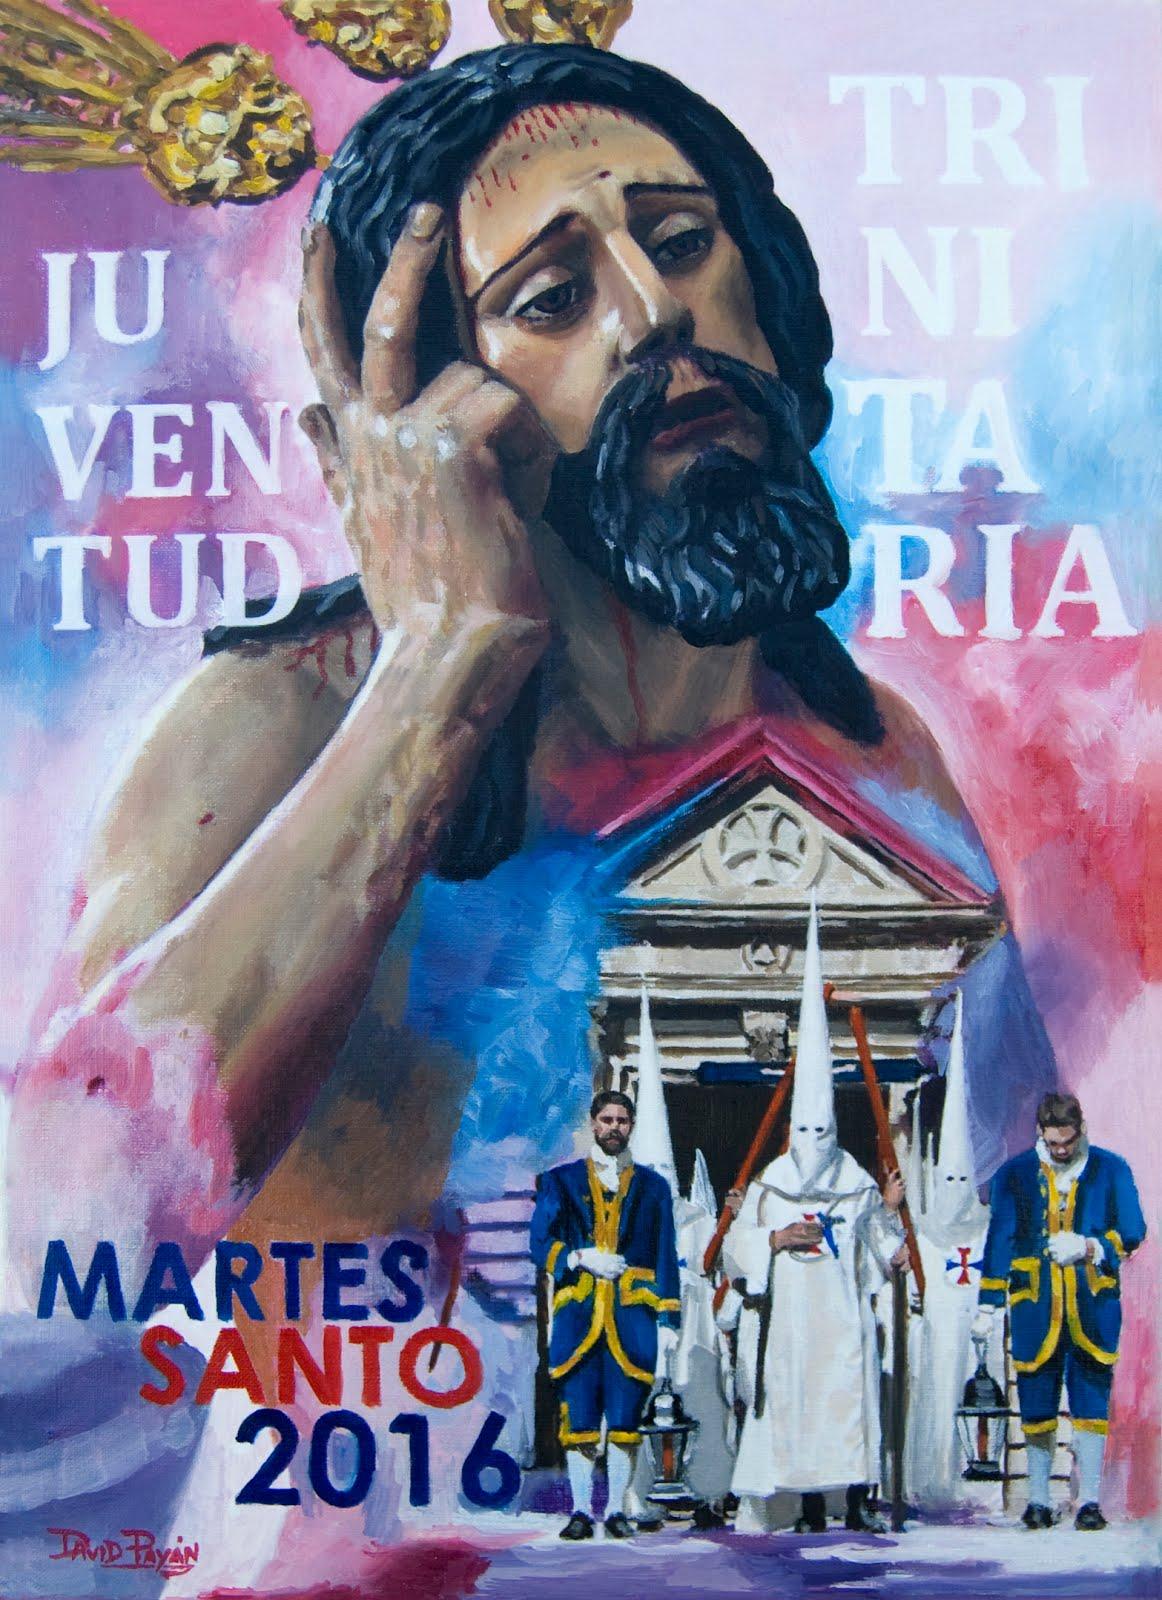 Cartel de la Hermandad. Semana Santa 2016